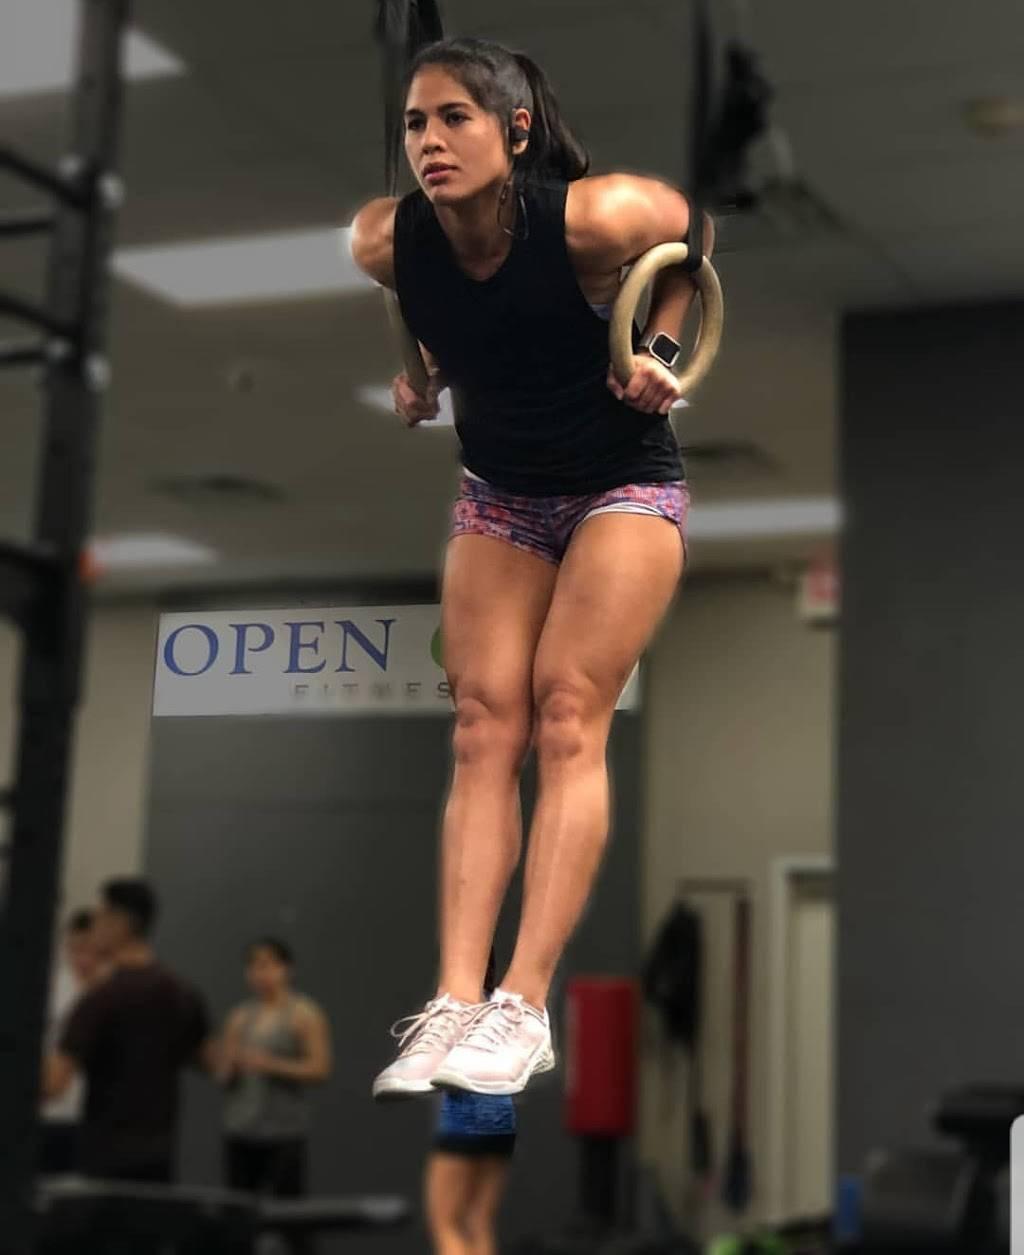 Open Gym Fitness - gym  | Photo 5 of 8 | Address: 10010 W Cheyenne Ave # 110, Las Vegas, NV 89129, USA | Phone: (702) 907-8907